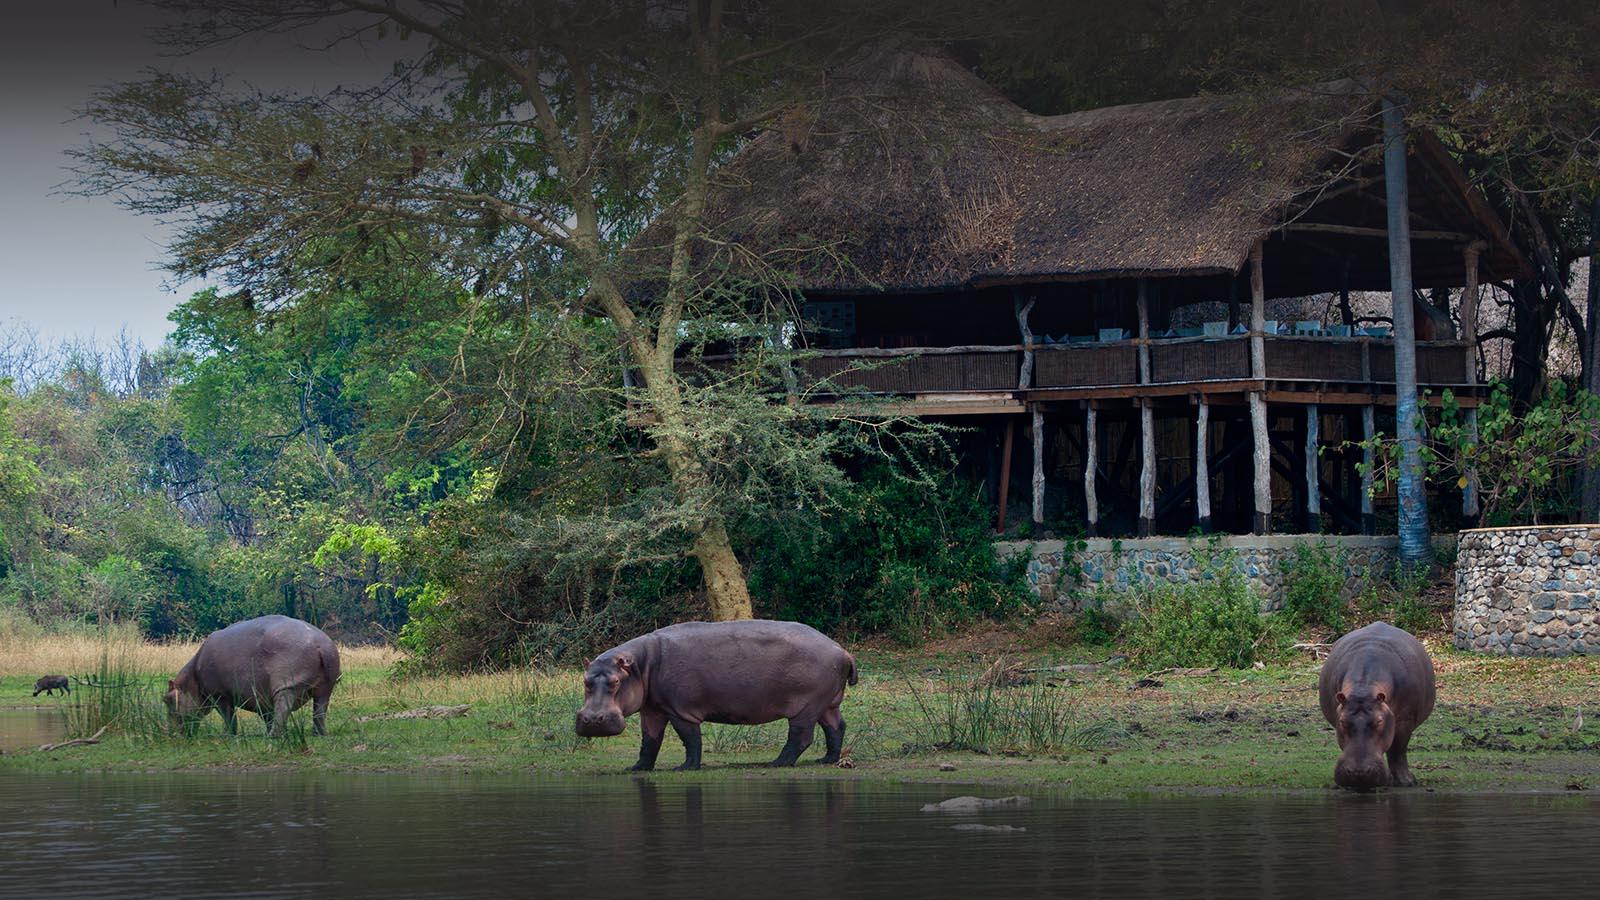 malawi-south-luangwa-green-season-zambia-in-style-safari-packages-tours-luxury-mvuu-lodge-hippos